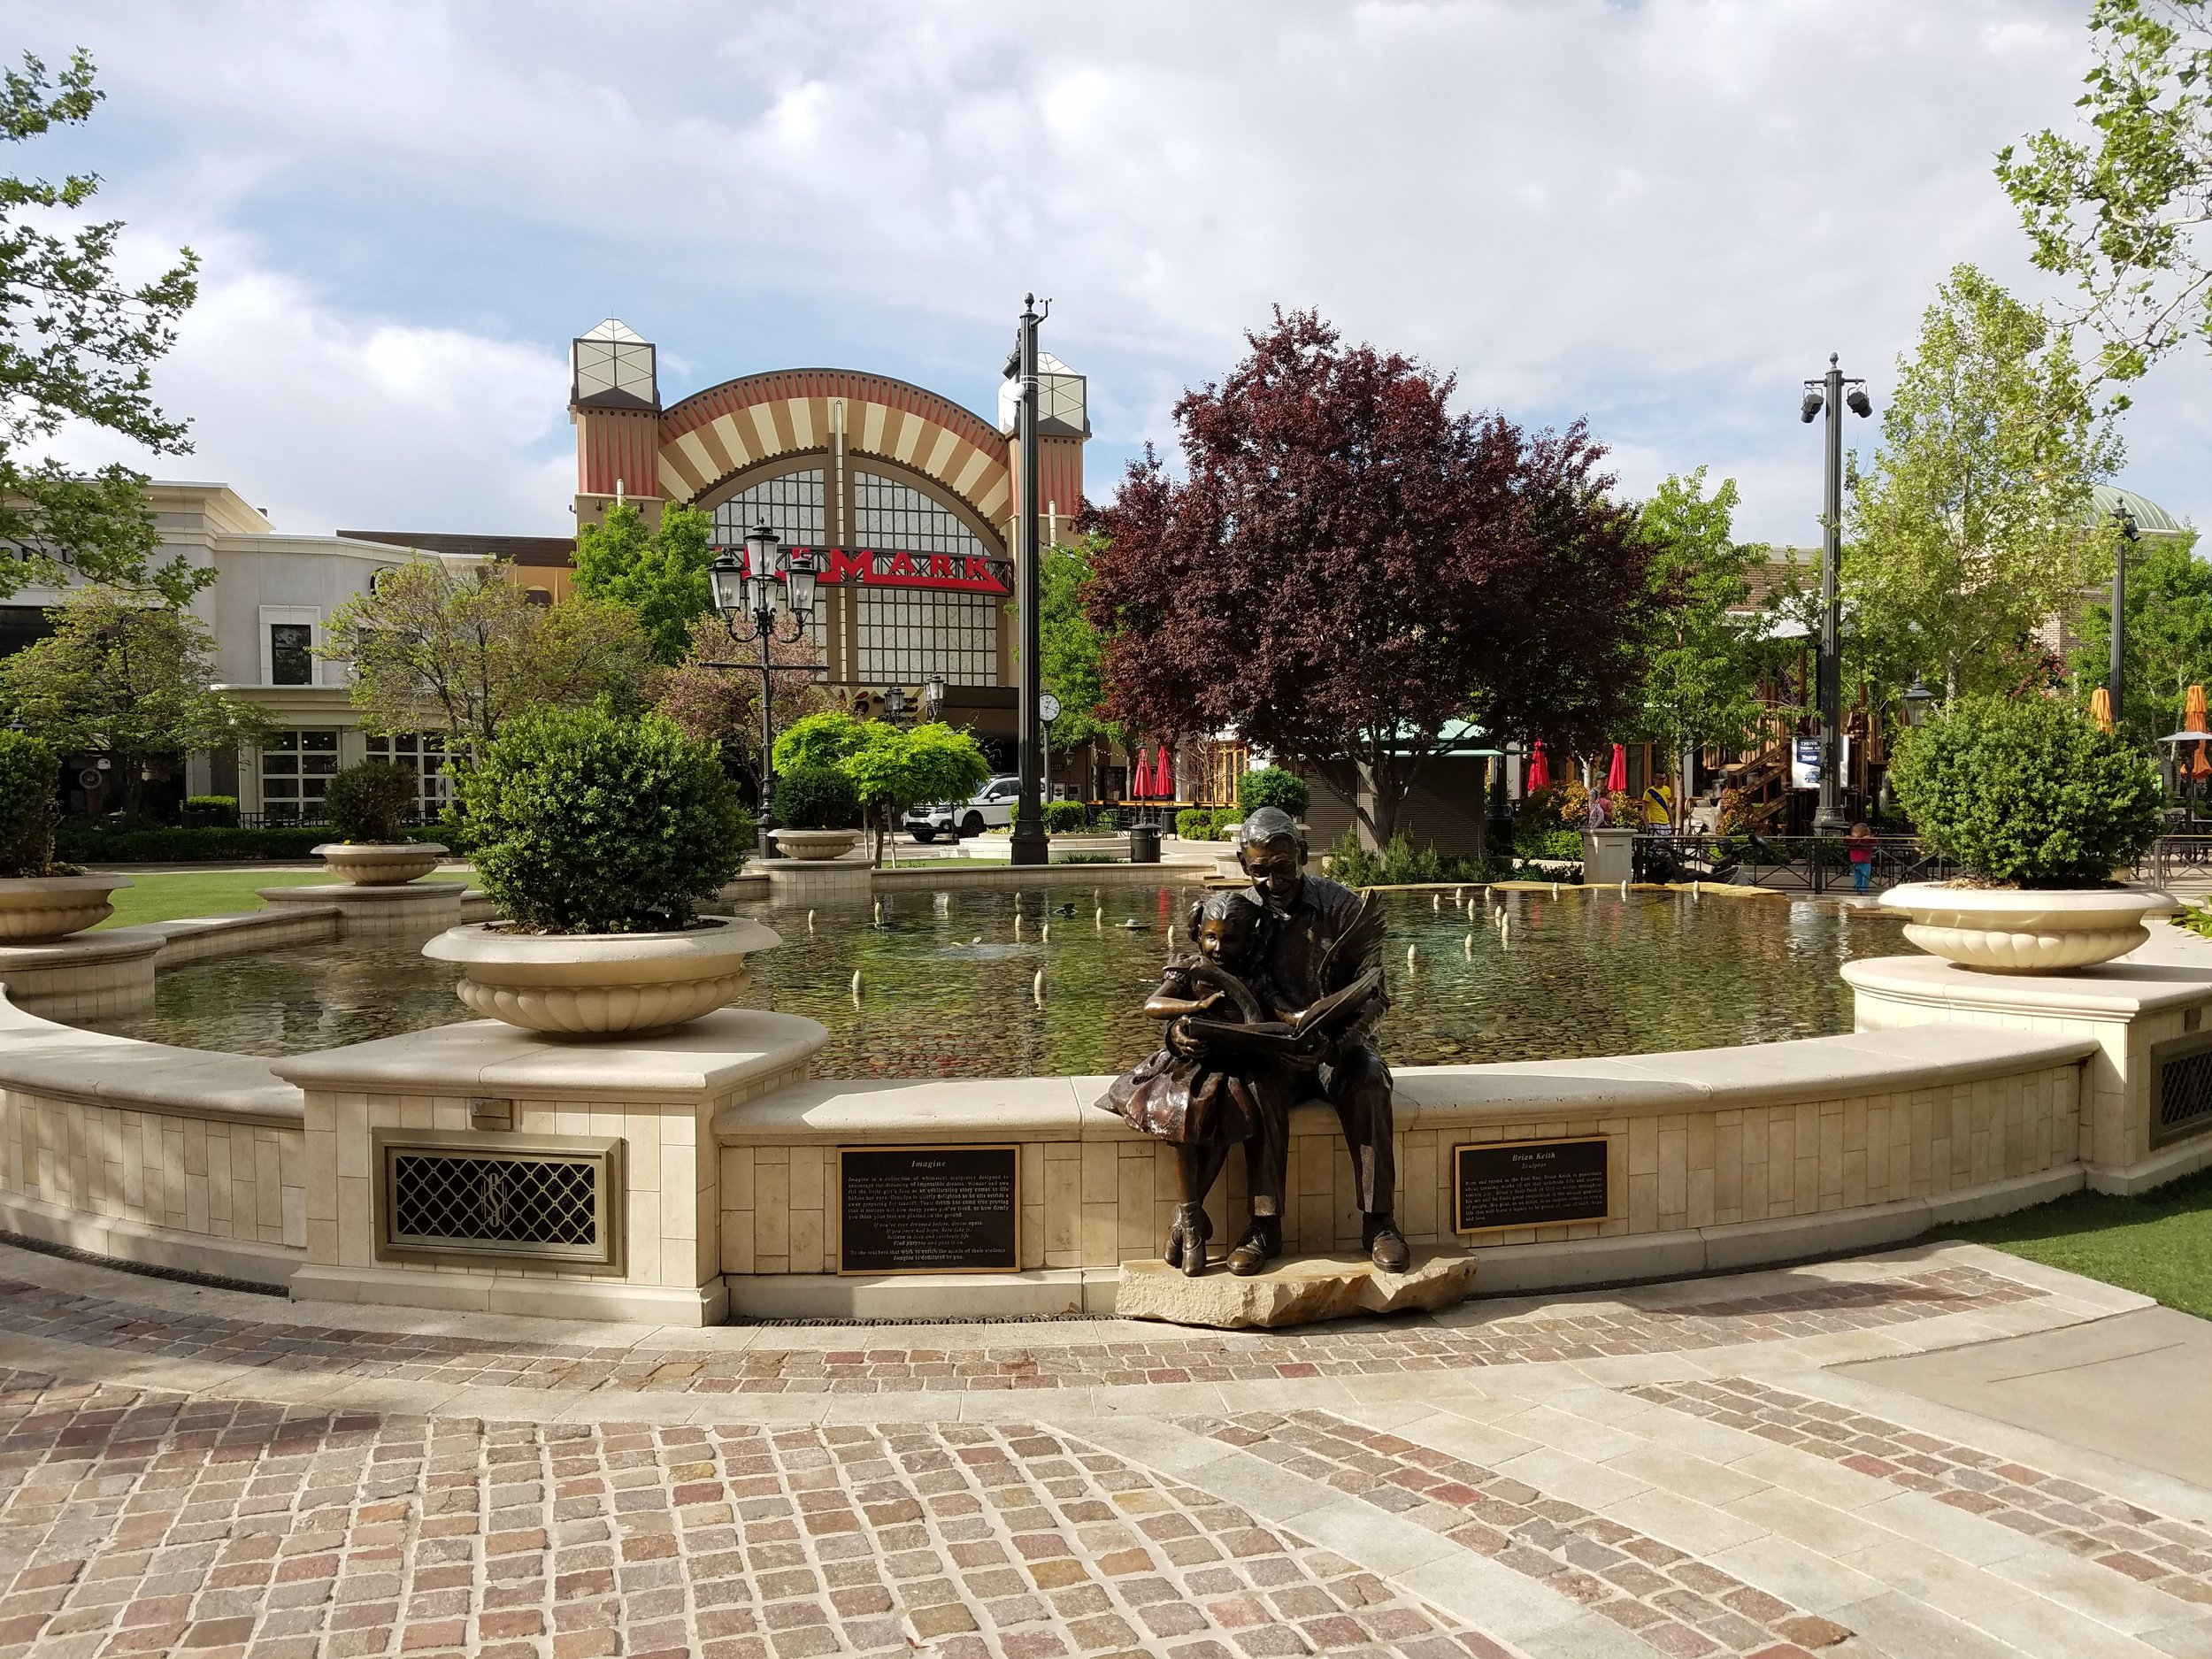 cinemark theater - farmington station park - utah